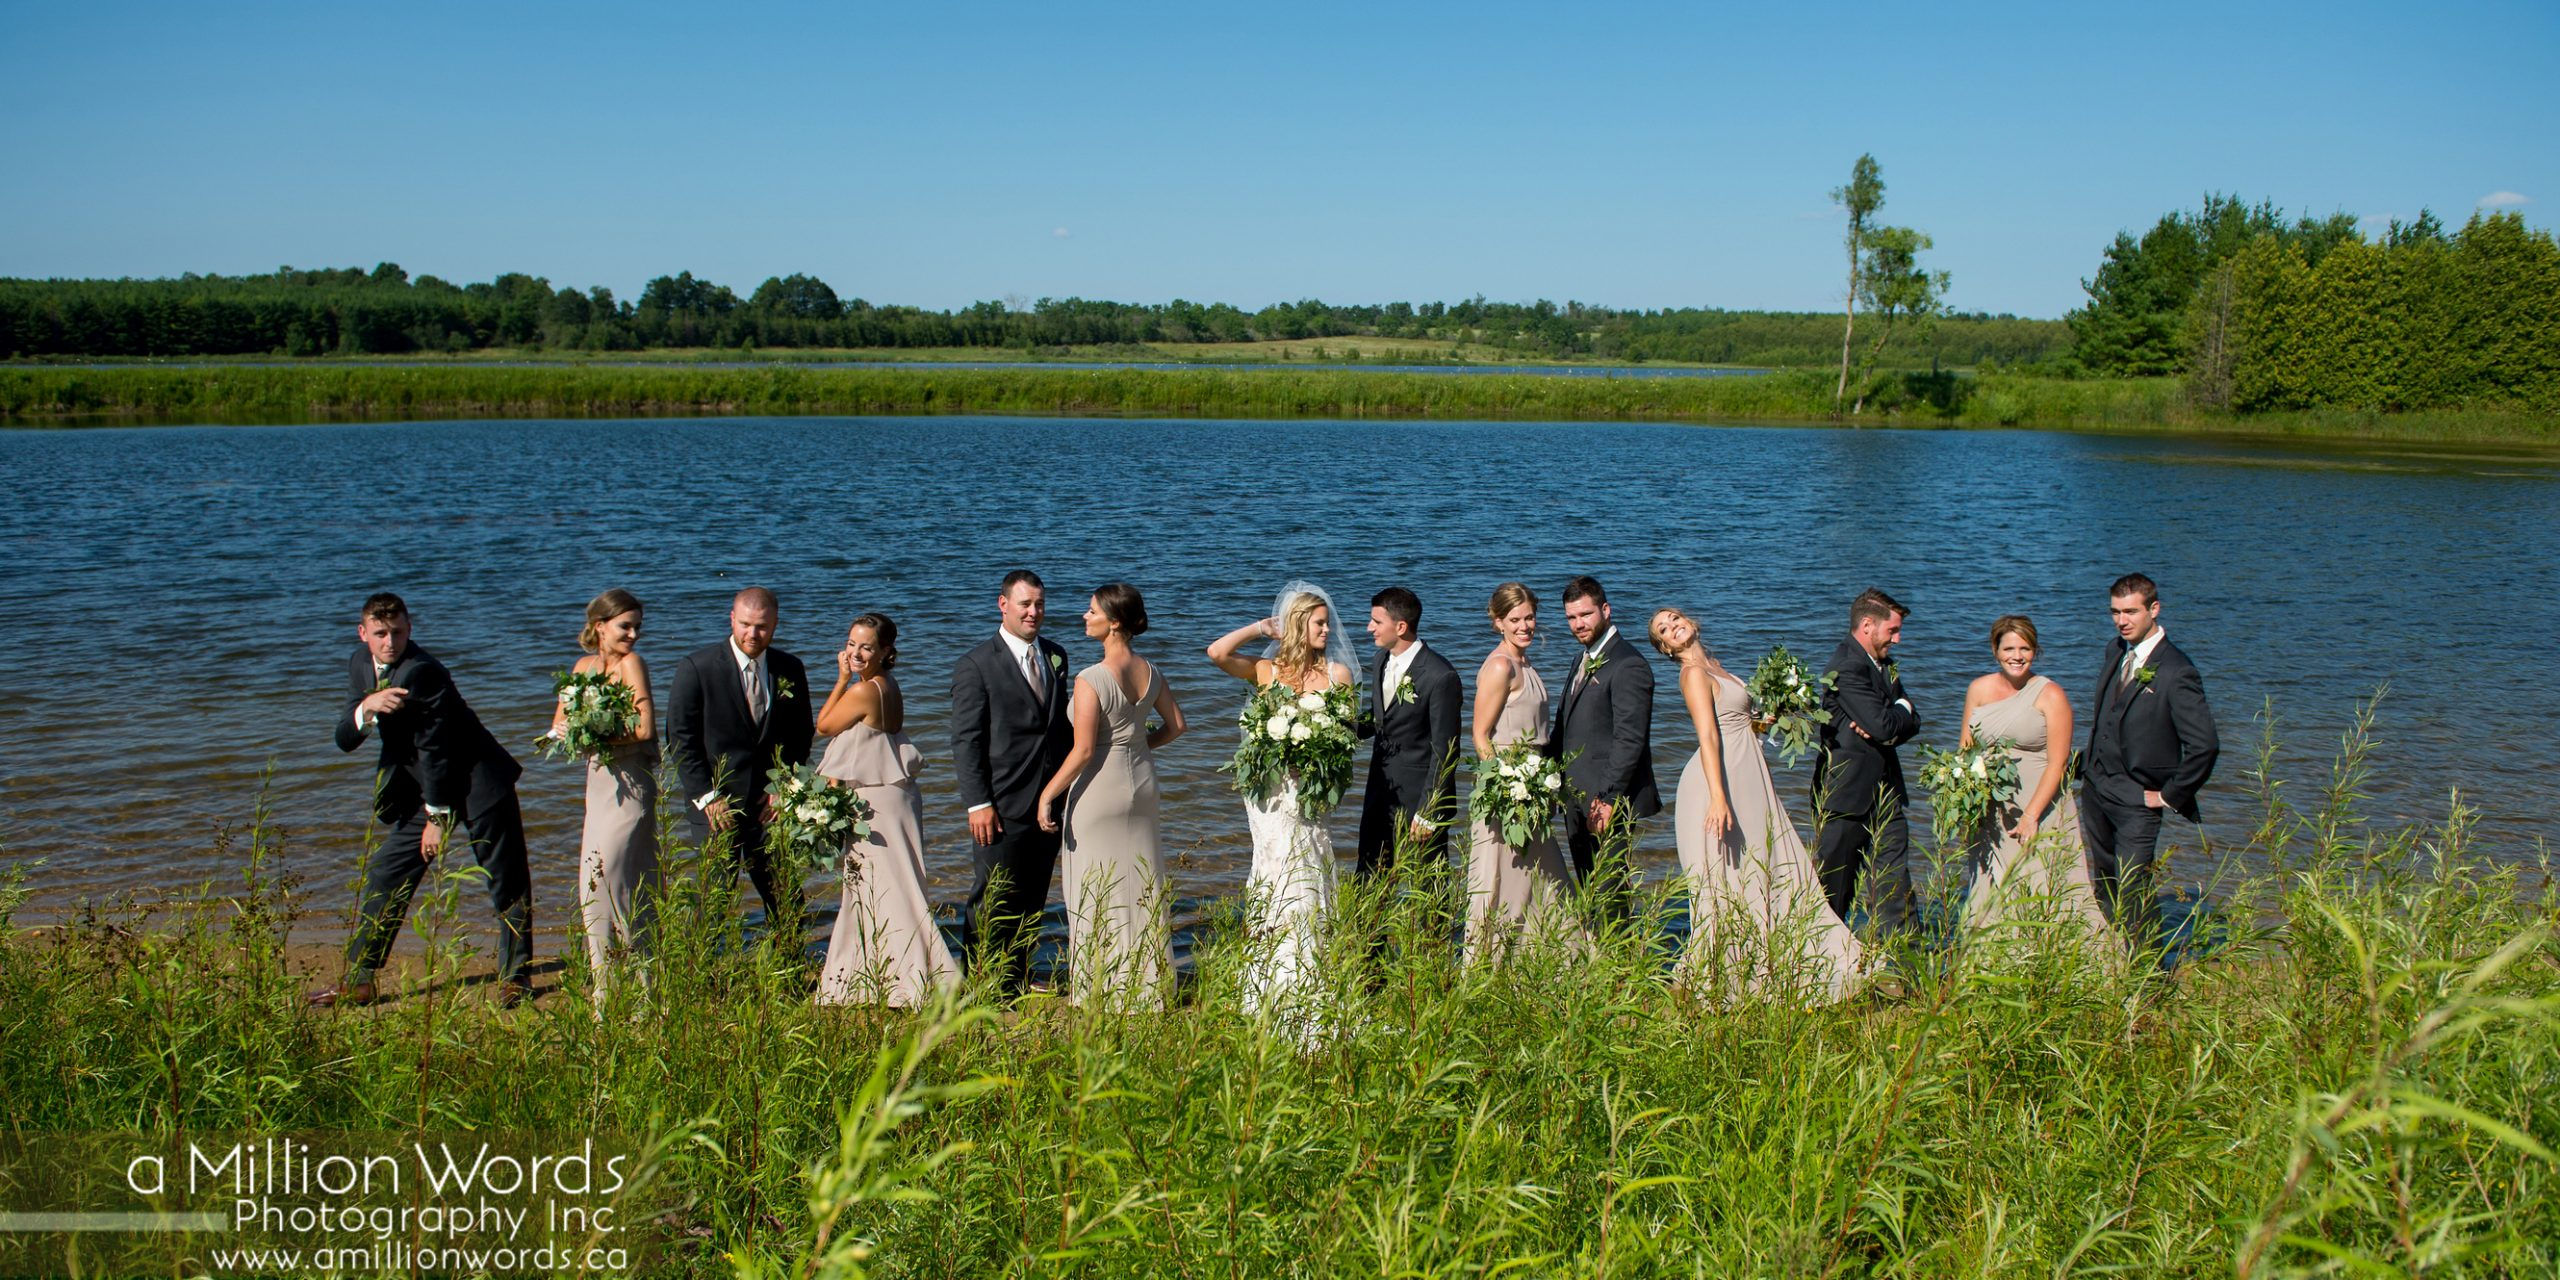 arthur_wedding_photographer47